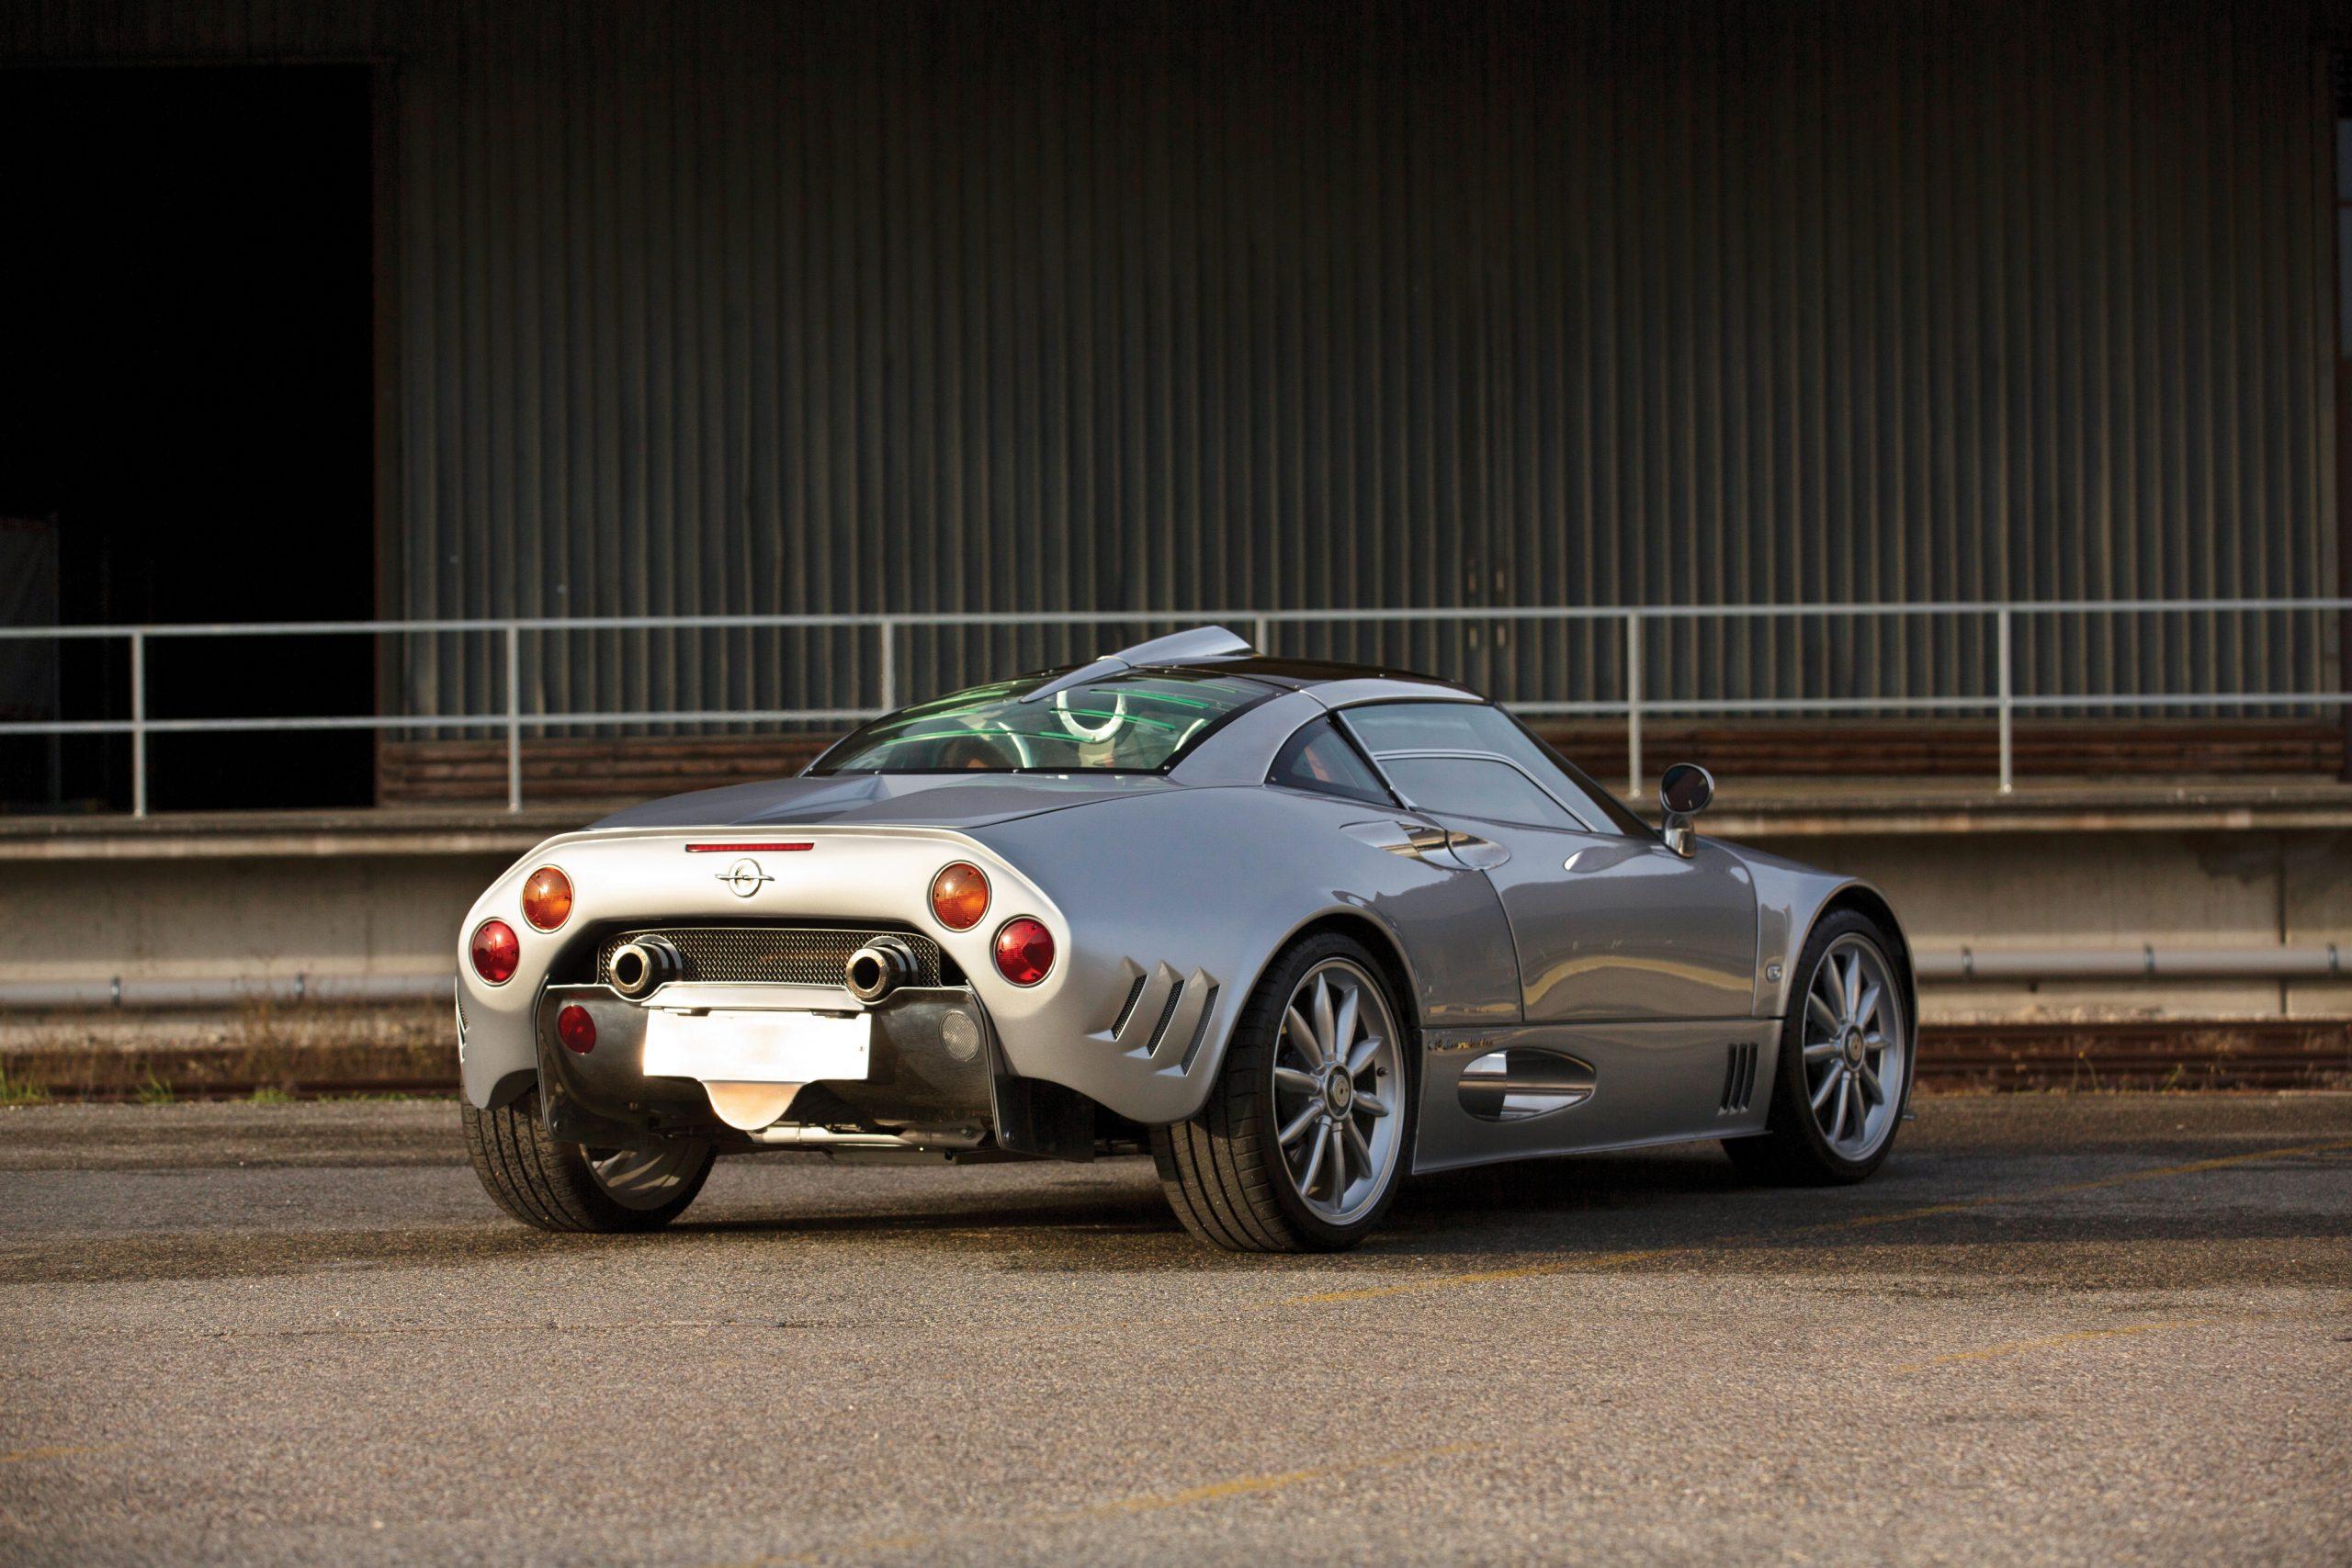 2008 Spyker C8 Laviolette